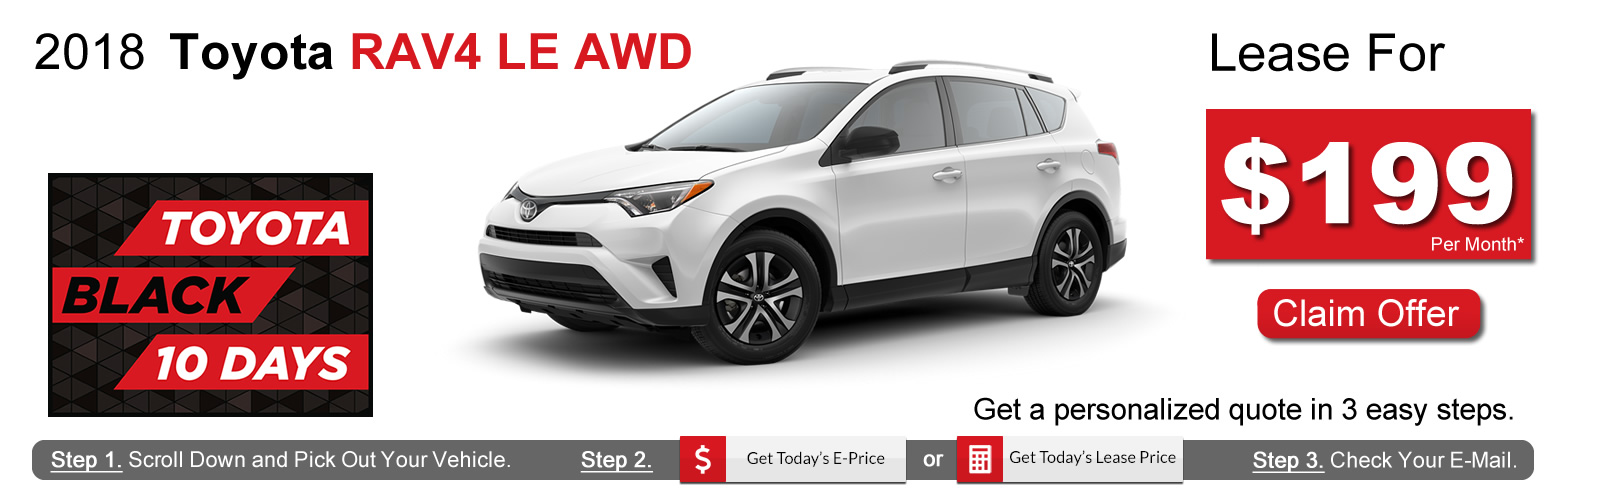 2018 Toyota RAV4 Lease Deals near Boston, MA